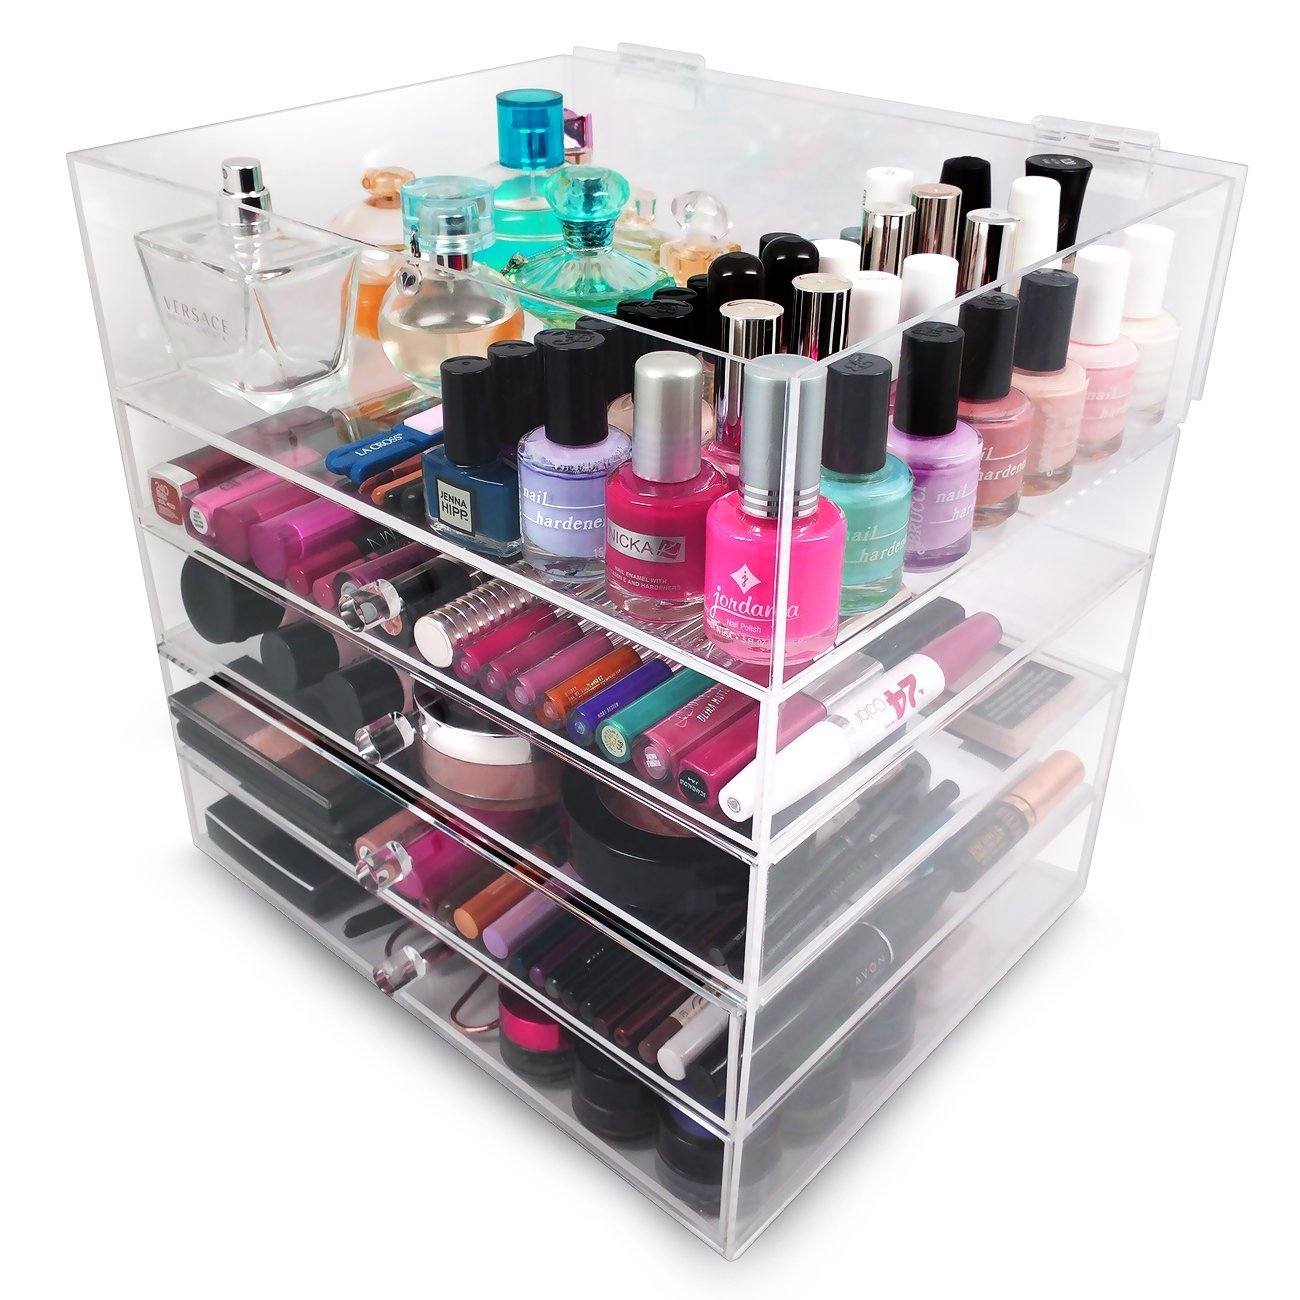 Amazon.com Sorbus 5-Tier Acrylic Cosmetic and Makeup Storage Case Organizer Home u0026 Kitchen  sc 1 st  Amazon.com & Amazon.com: Sorbus 5-Tier Acrylic Cosmetic and Makeup Storage Case ...